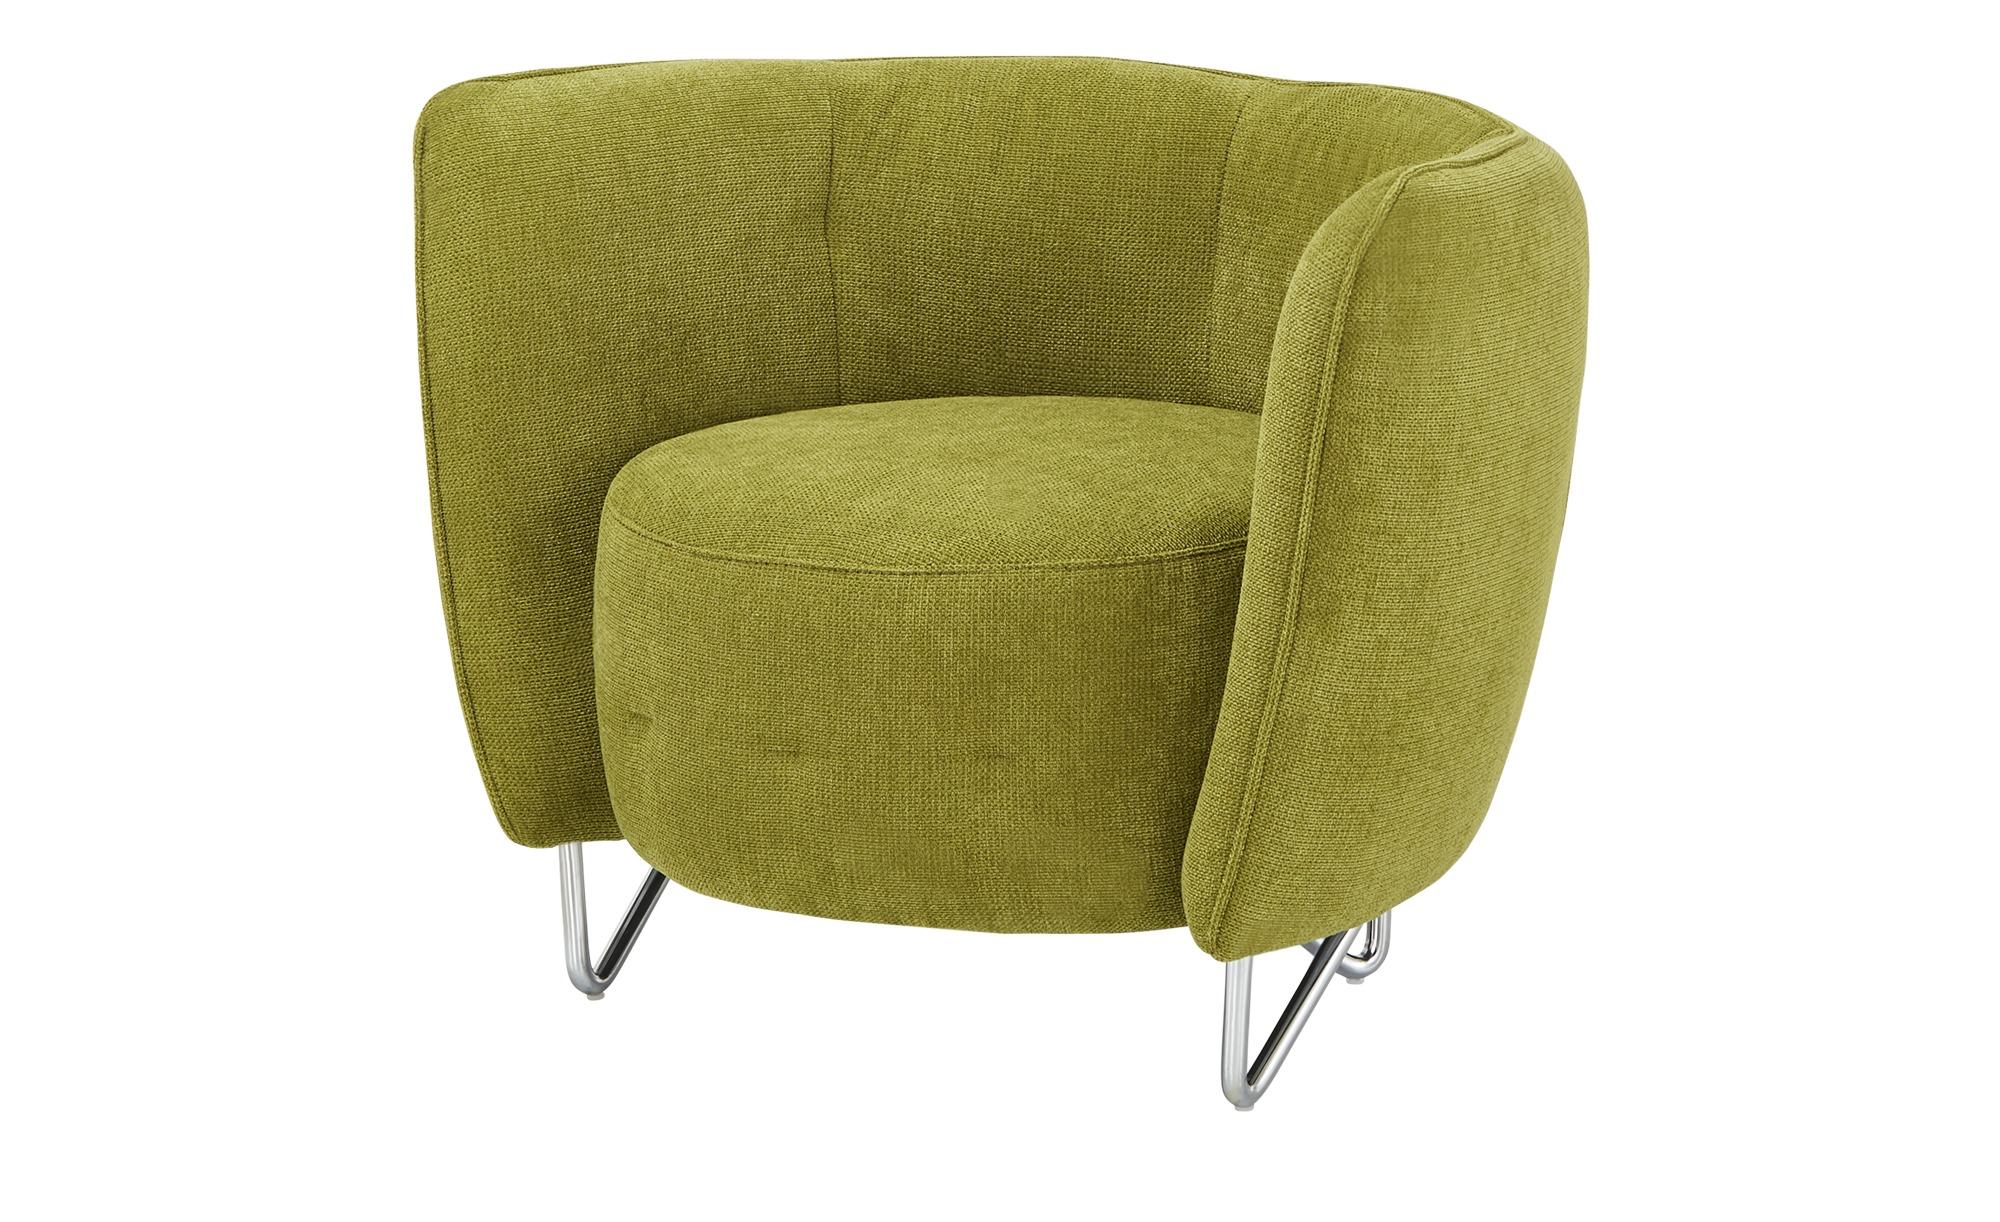 uno Sessel - grün - 86 cm - 66 cm - 69 cm - Polstermöbel > Sessel > Cocktailsessel - Möbel Kraft | Wohnzimmer > Sessel > Cocktailsessel & Clubsessel | uno